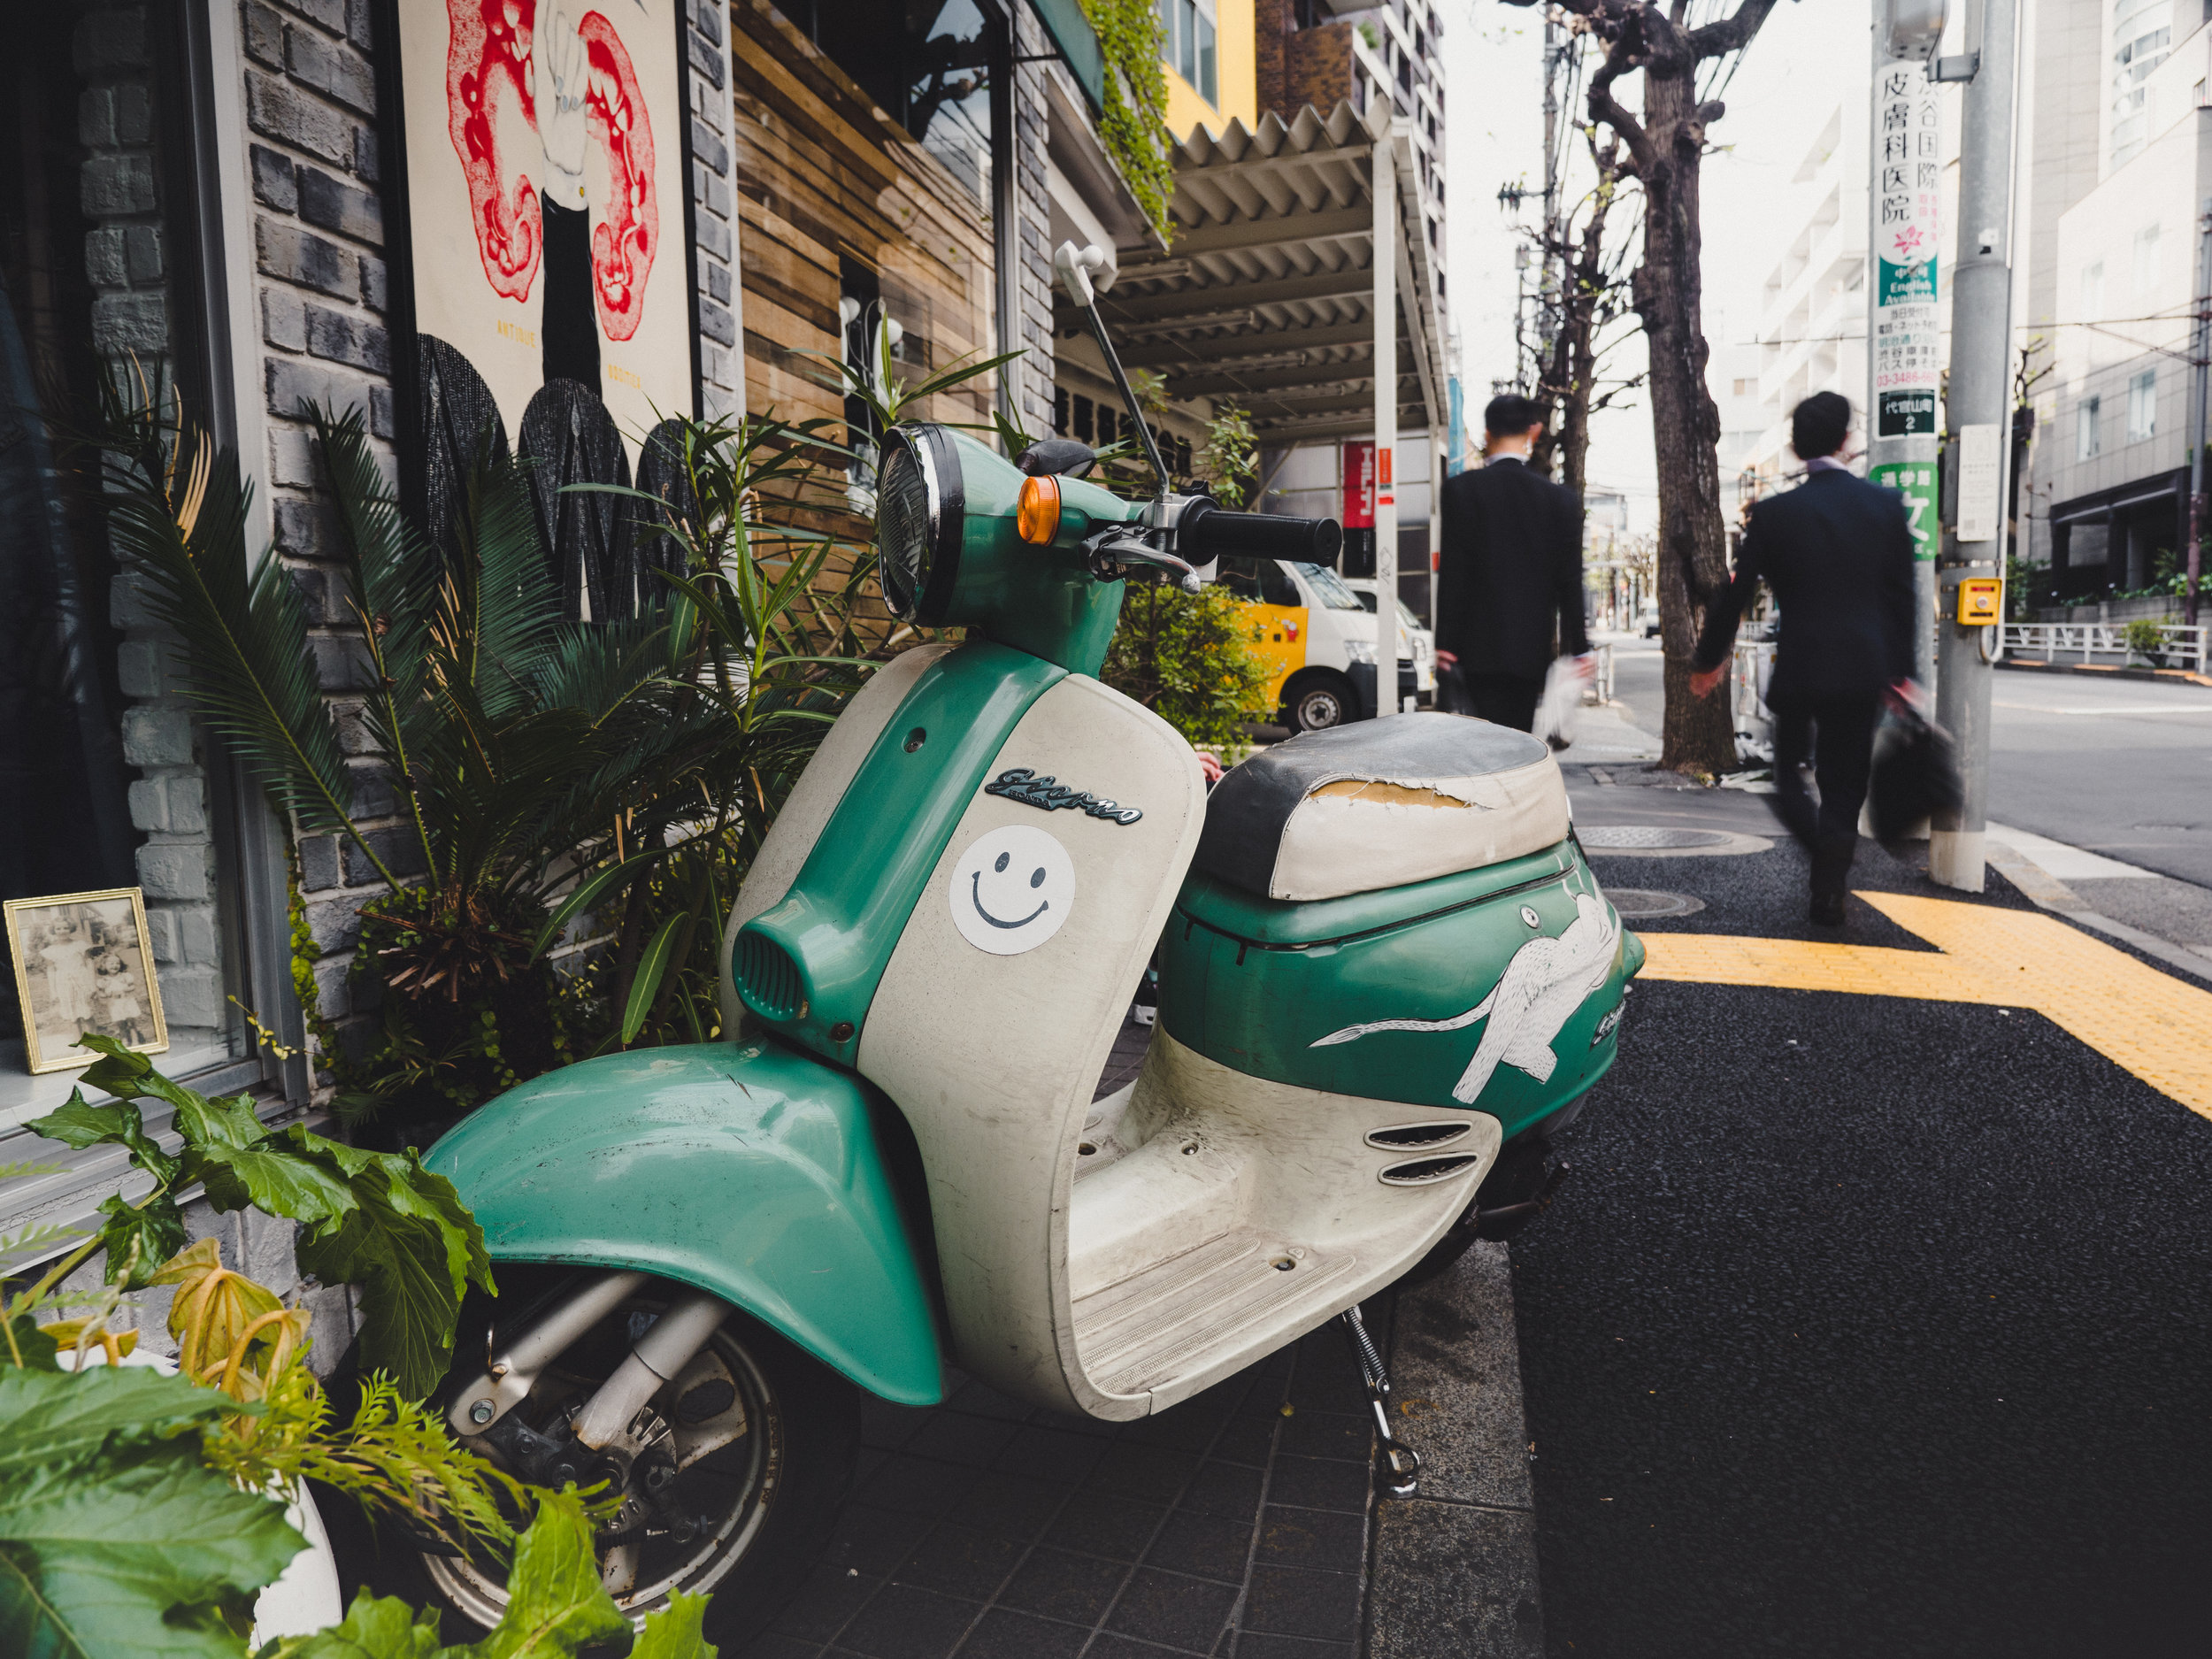 20180405_DC-GH5_Tokyo_P1011598.jpg